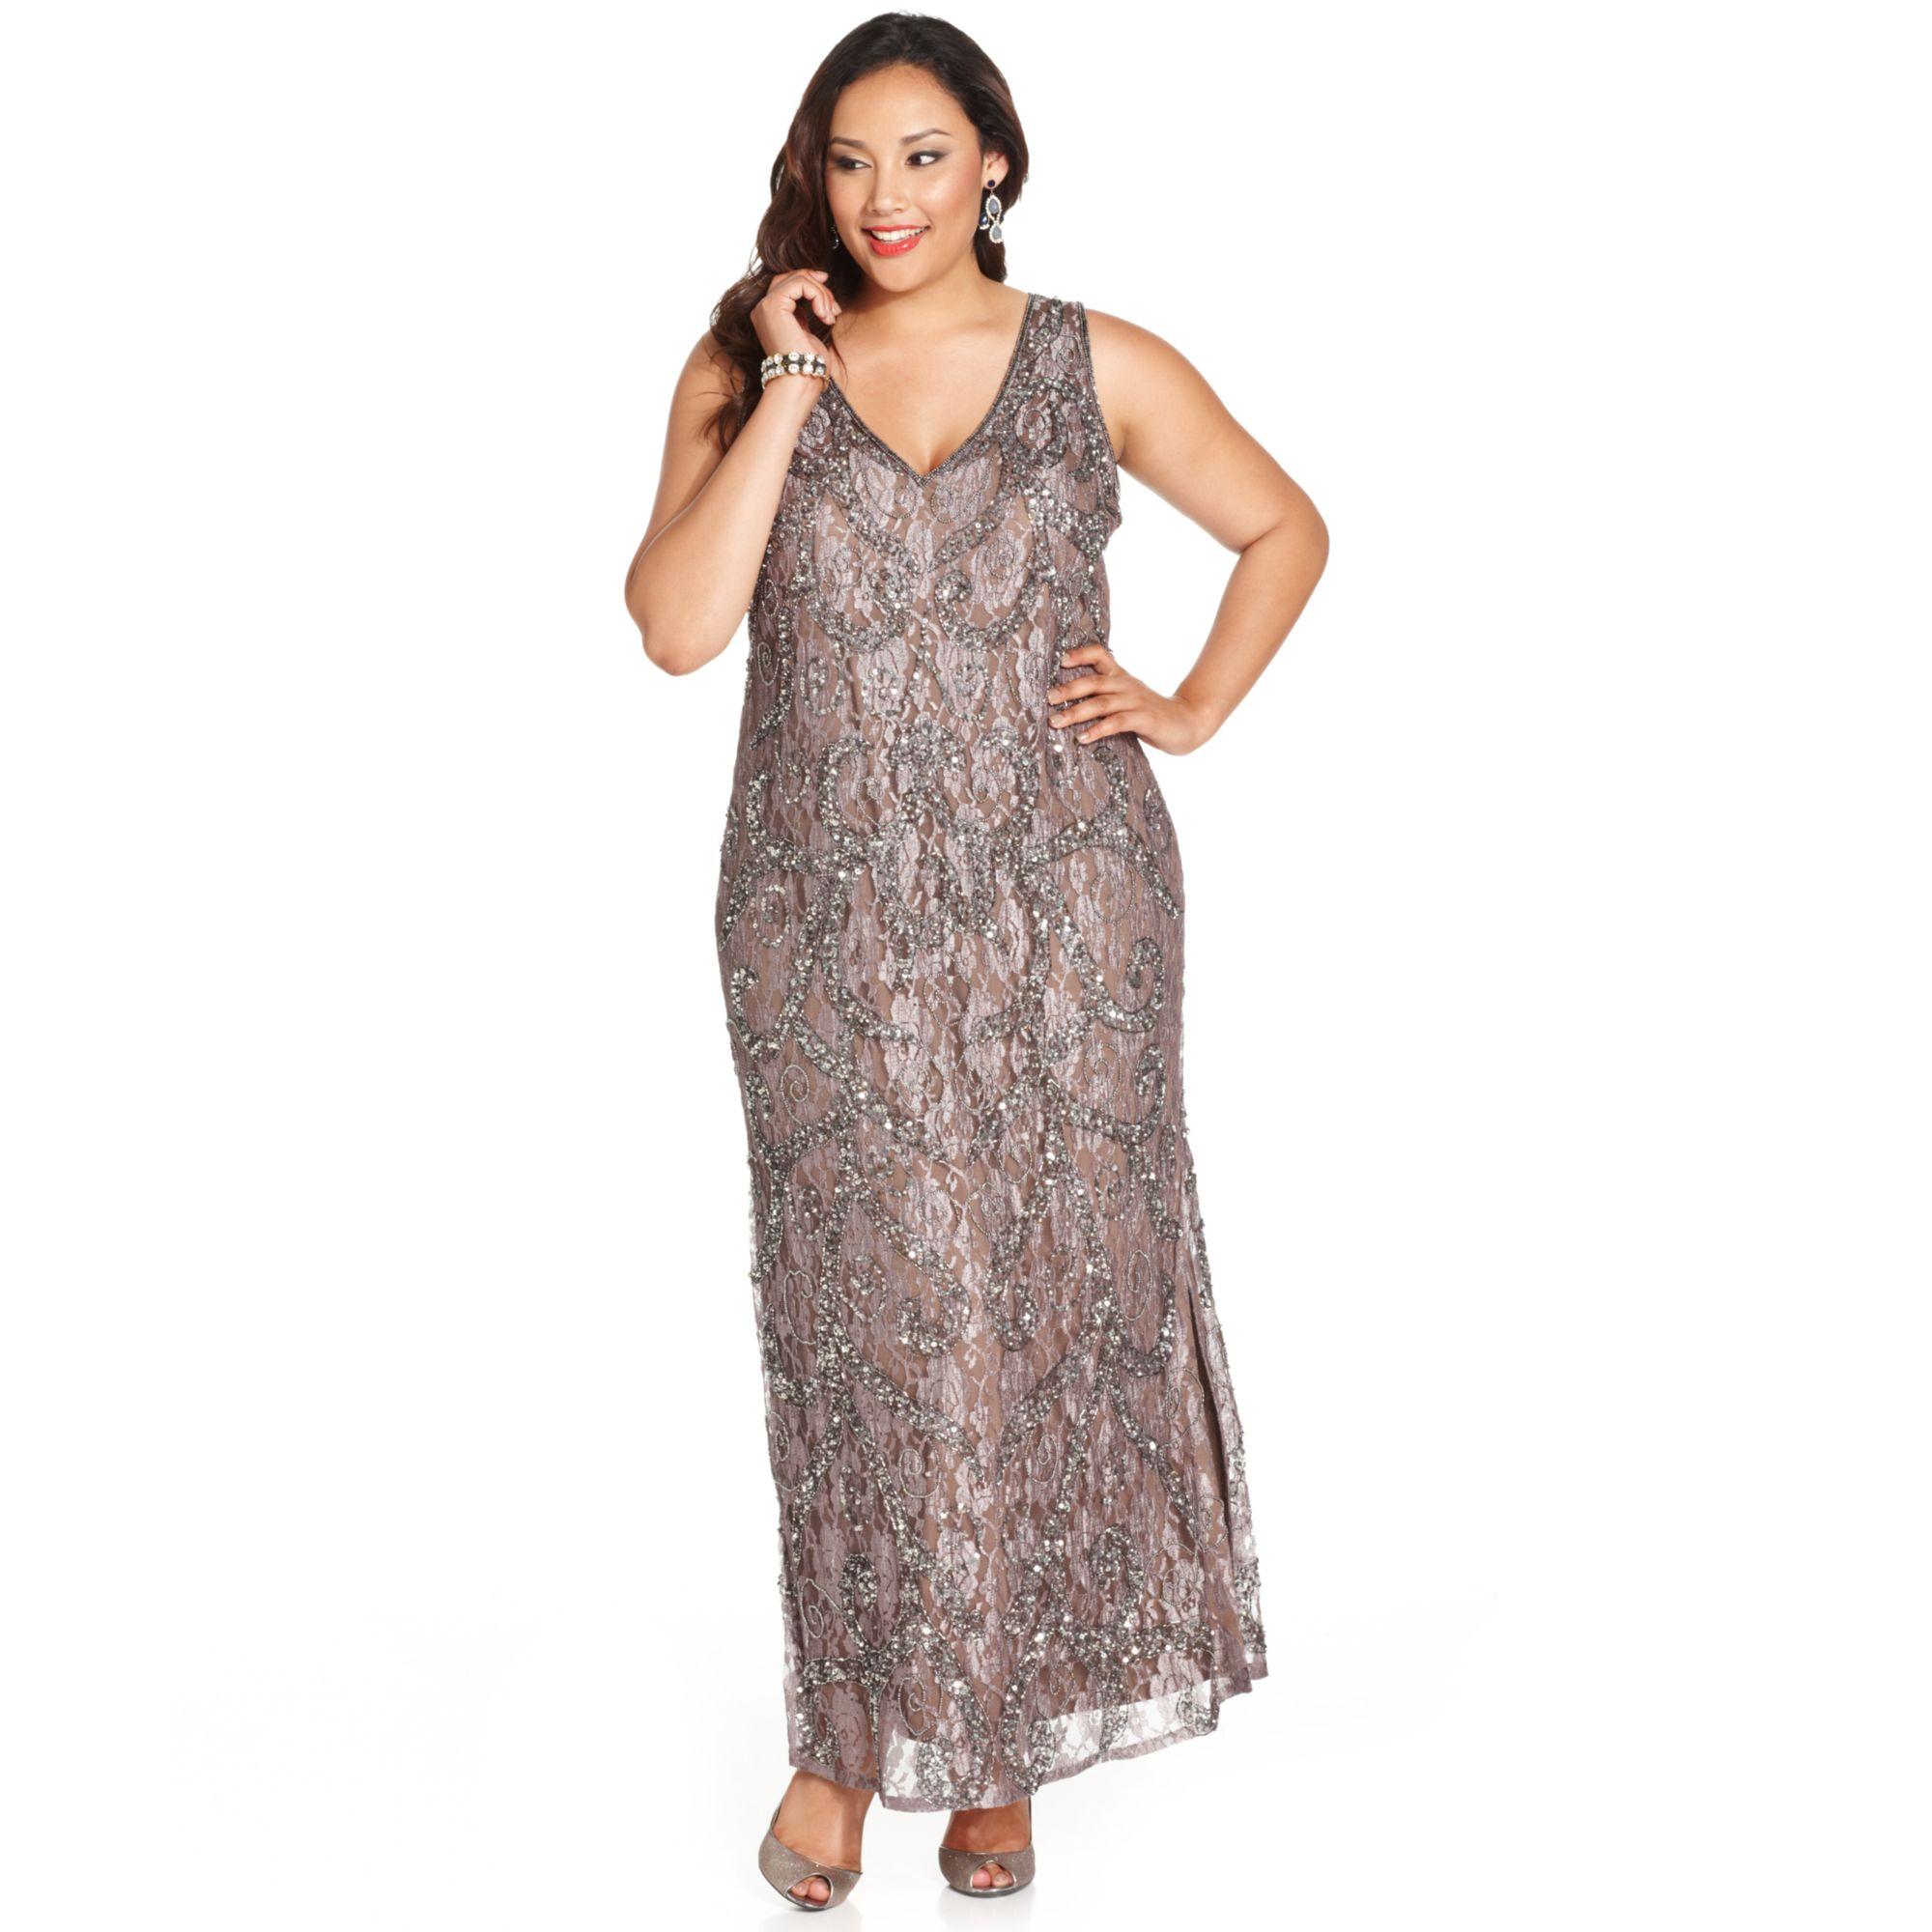 fcbaa6feeead6 Lyst - Pisarro Nights Plus Size Embellished Lace Gown in Metallic